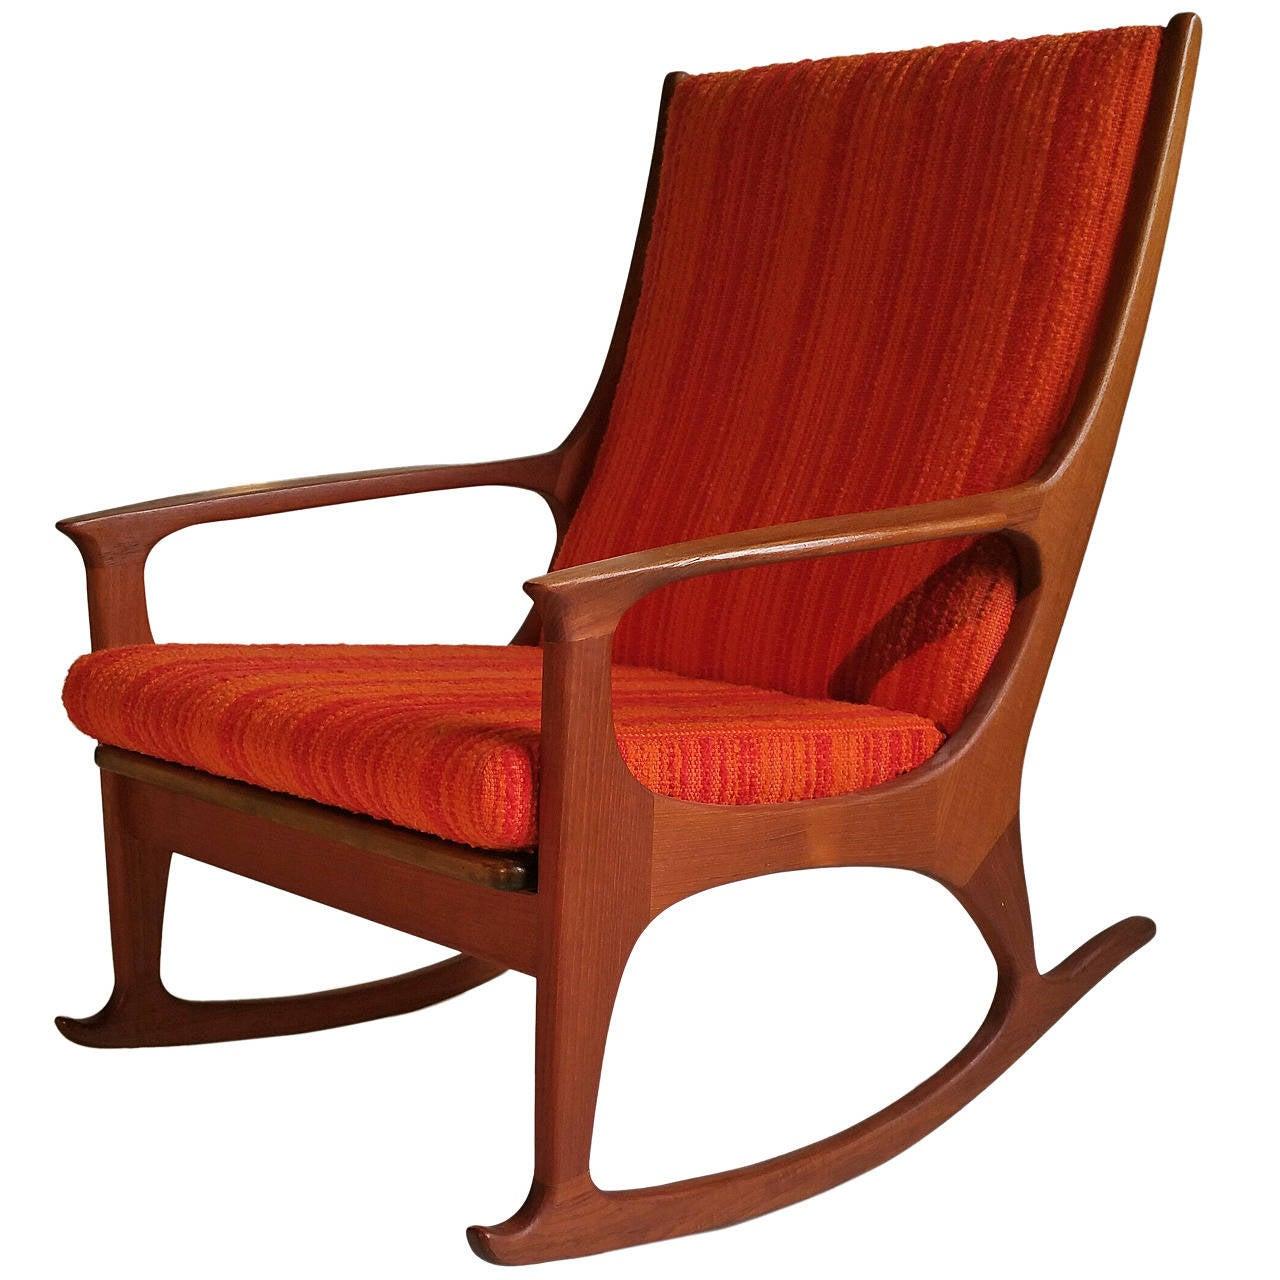 danish modern rocking chair used power chairs midcentury teak at 1stdibs